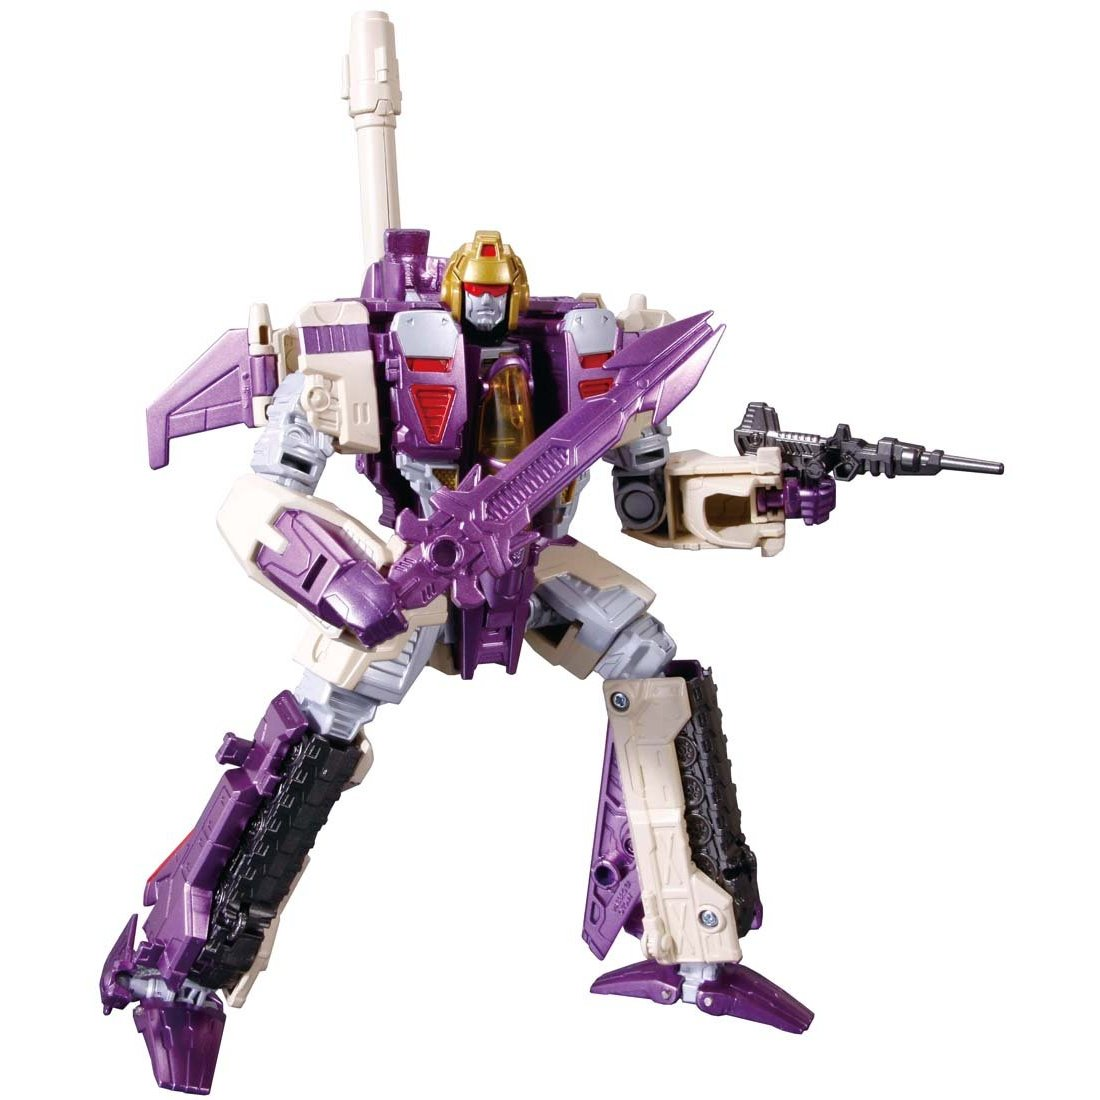 Blitzwing - Transformers Generations (Japan) - TFW2005